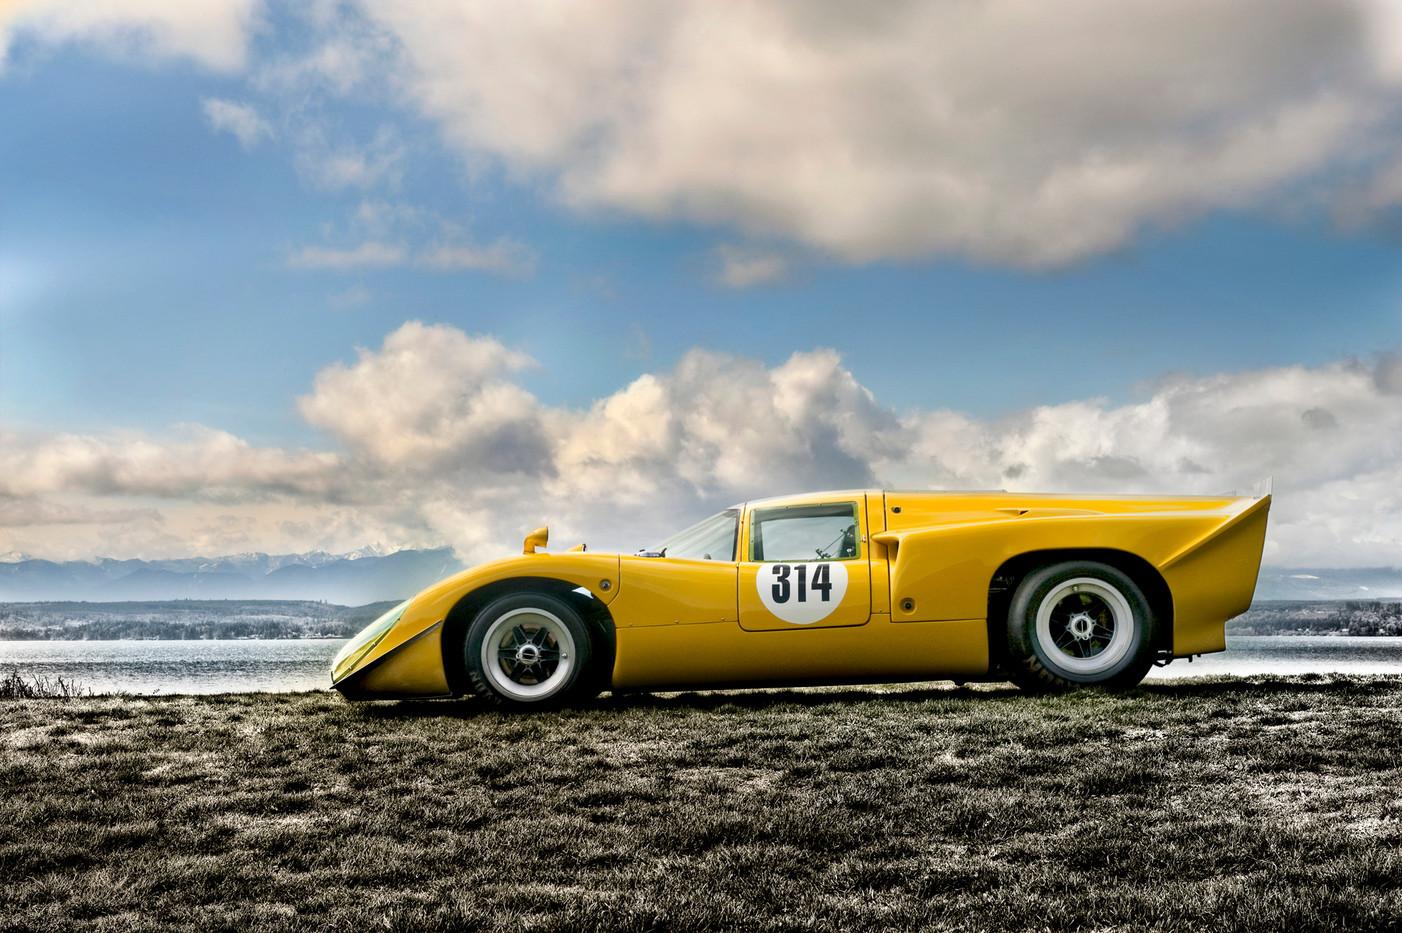 morgan_vintage cars_photography 7.jpg